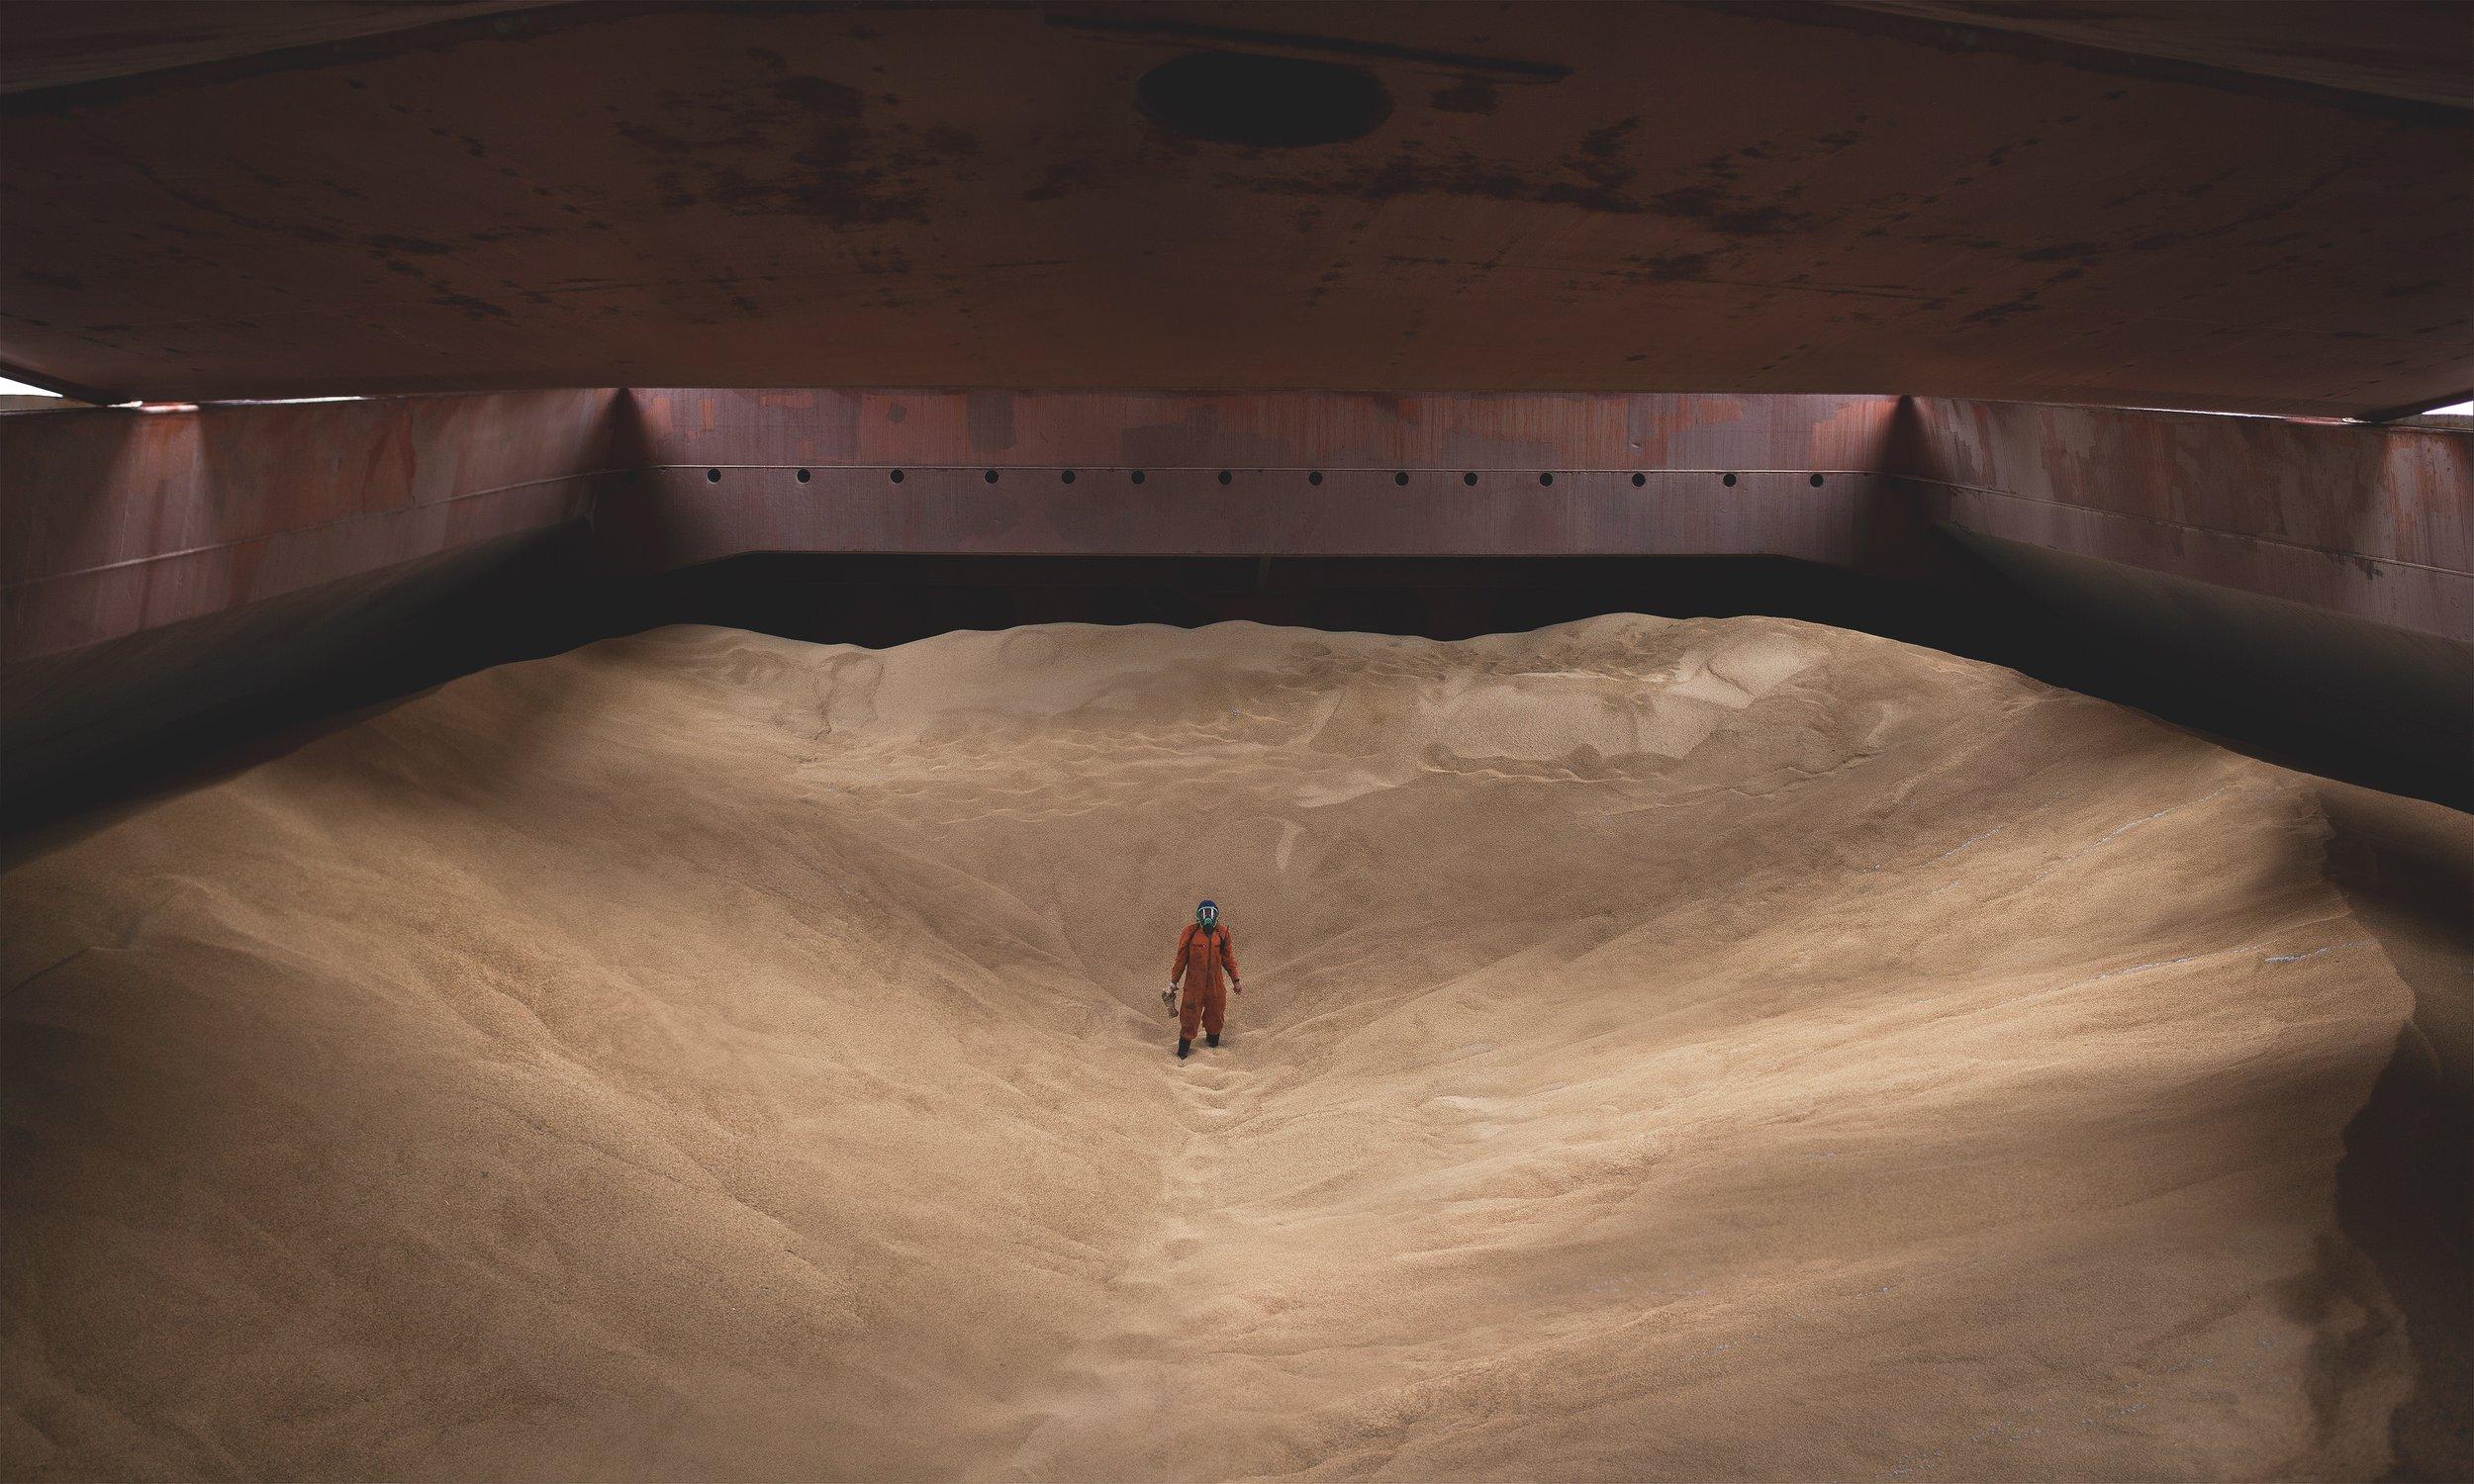 Desert on Board  (2016)  Série  Exotica, Erotica   Evangelia Kranioti  Courtesy Evangelia Kranioti + Vincent Sator